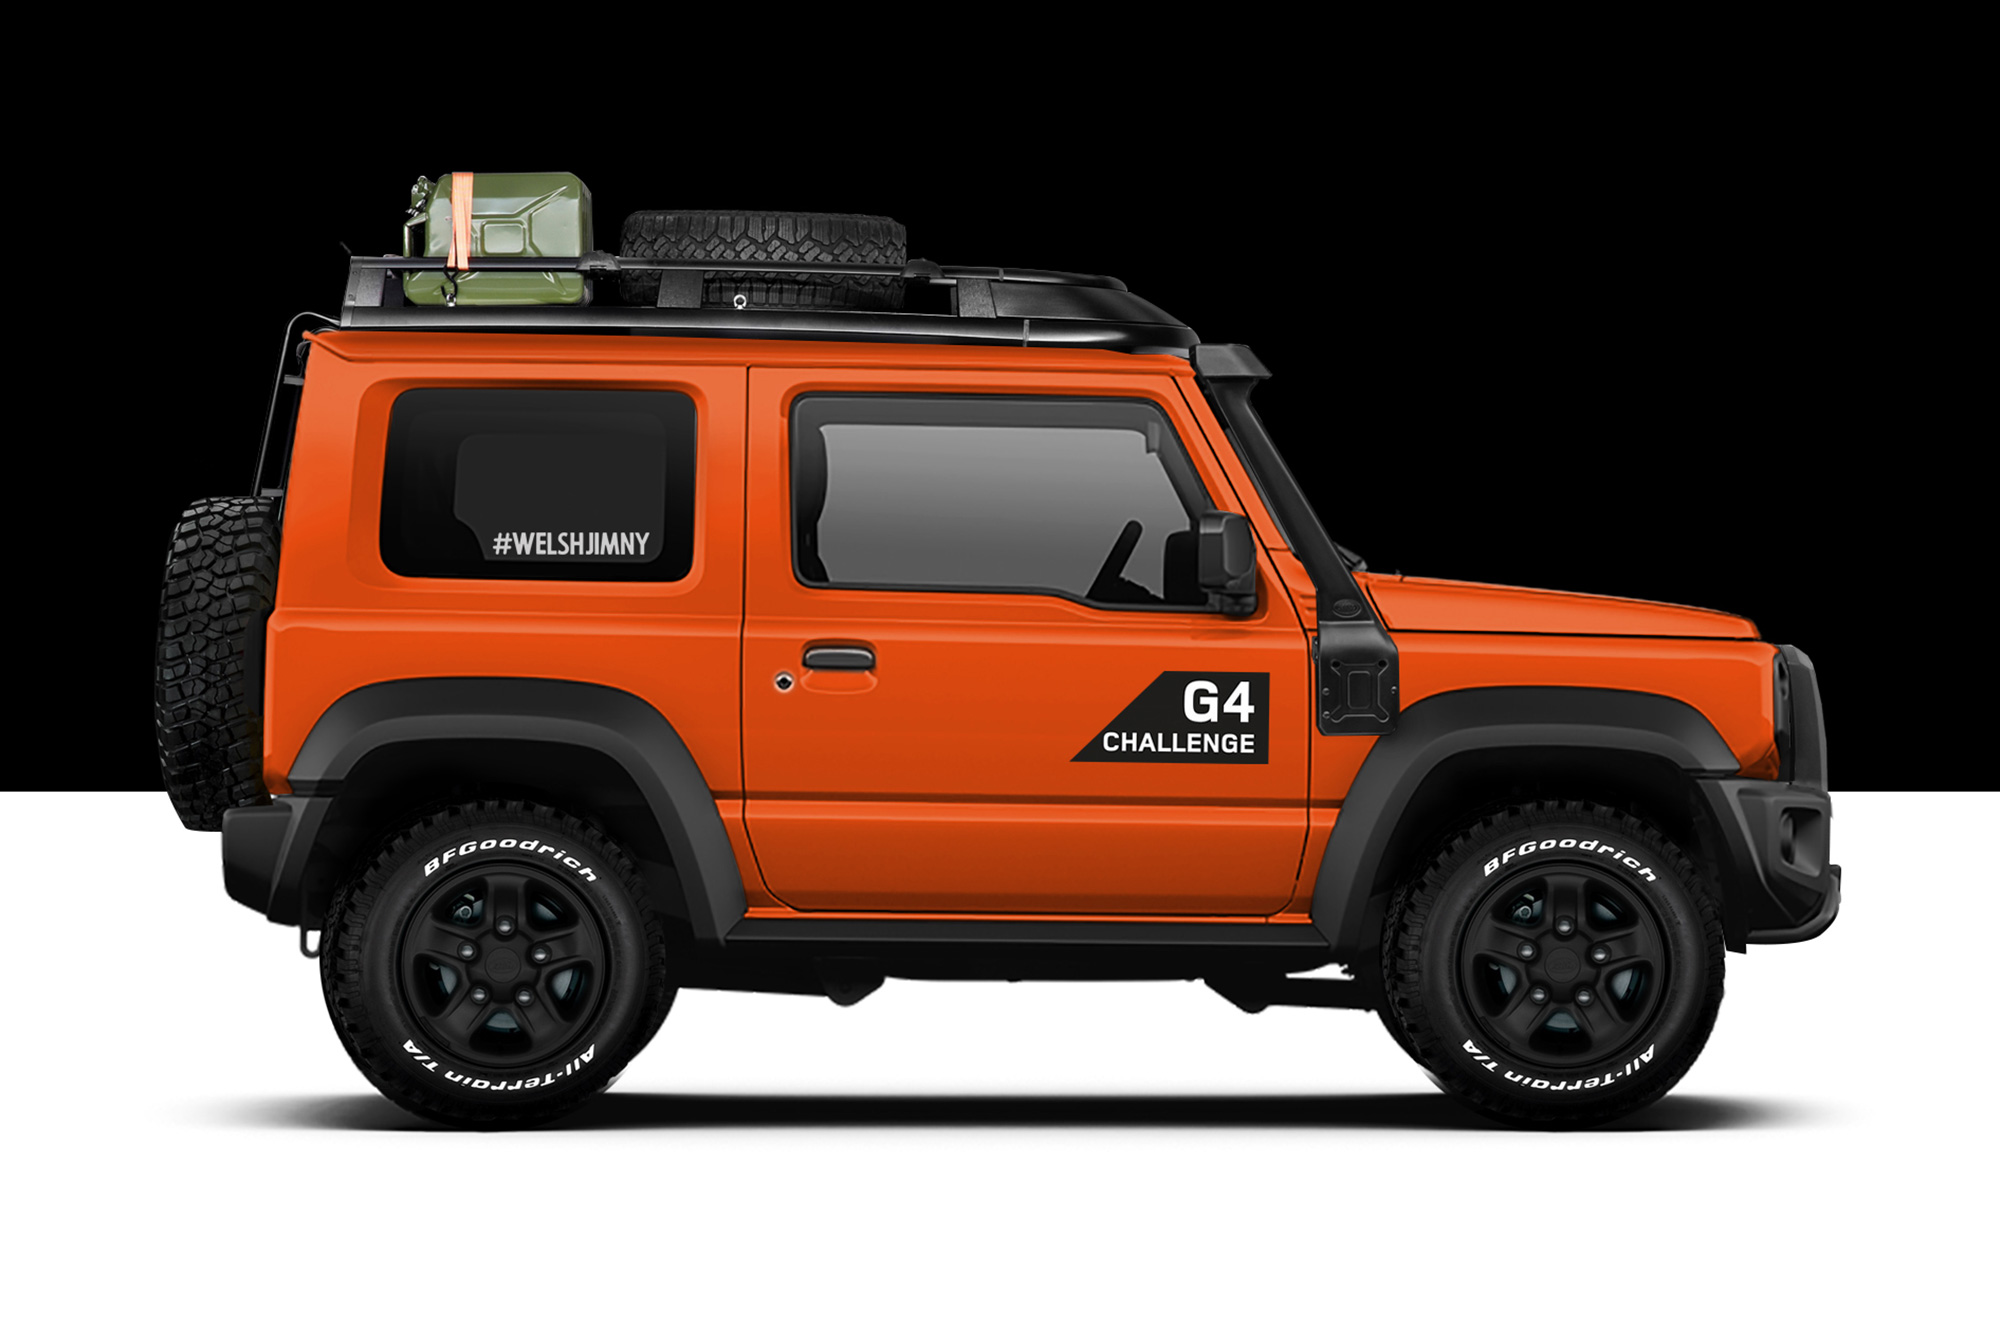 Jimny G4 Challenge Concept